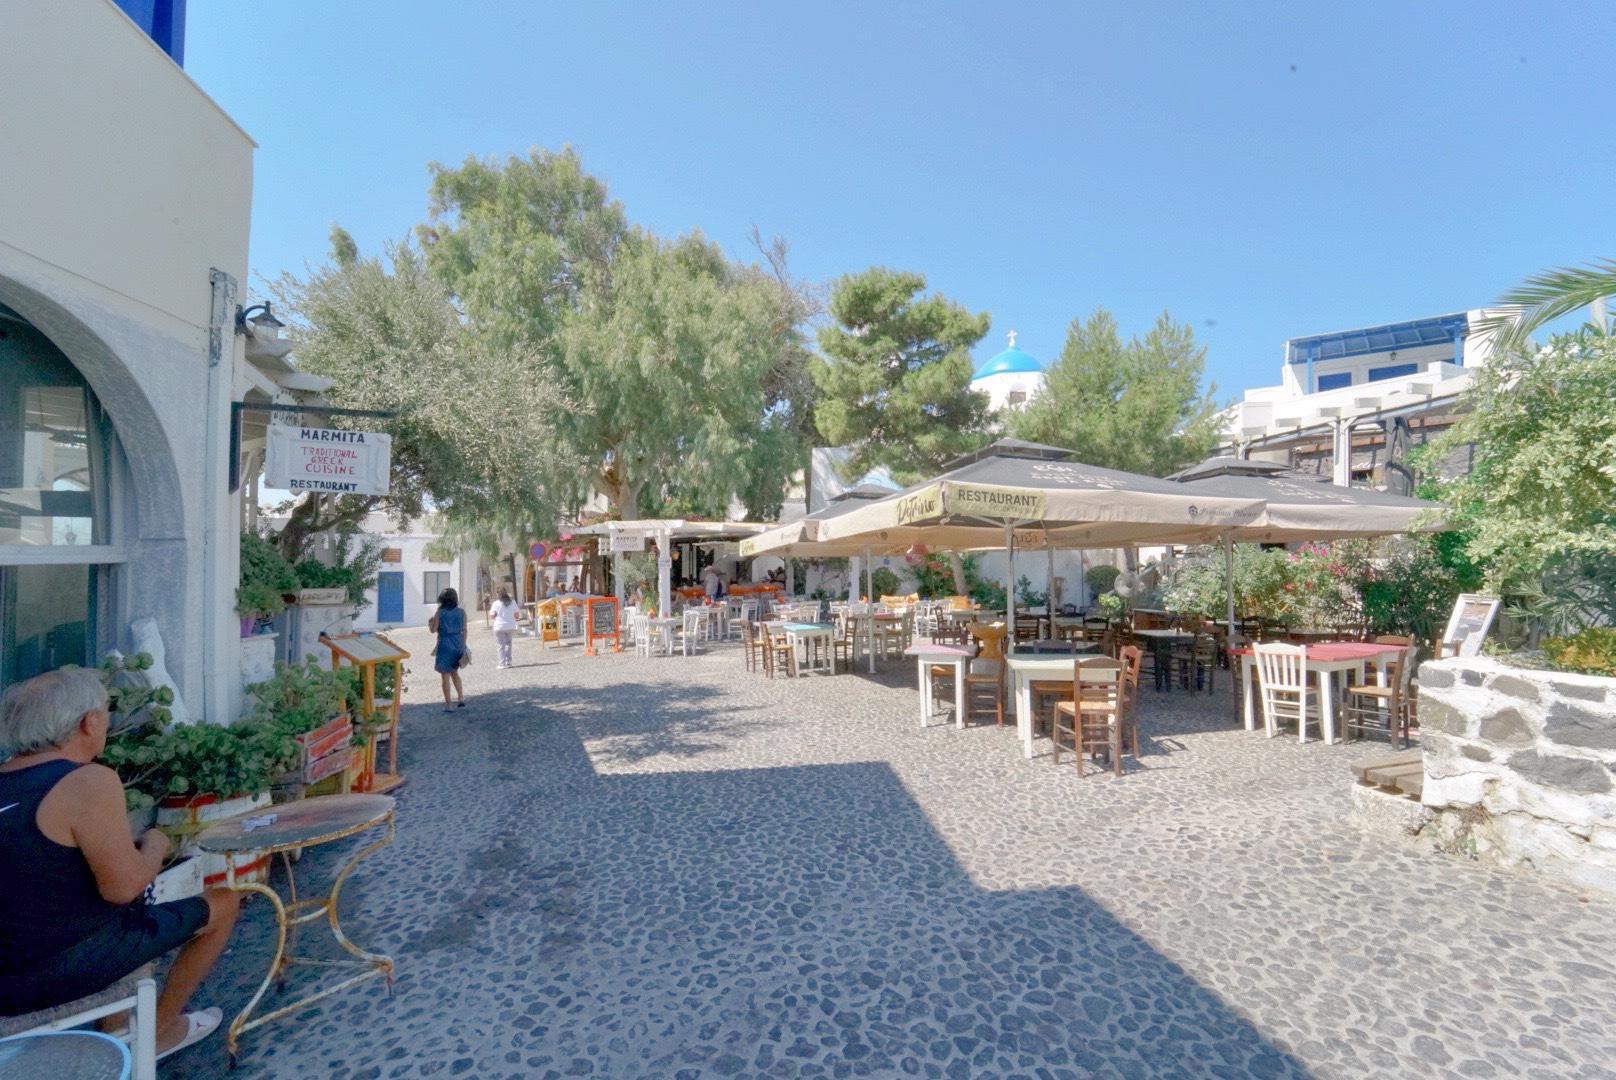 acs 0283 - A Few Days in Santorini